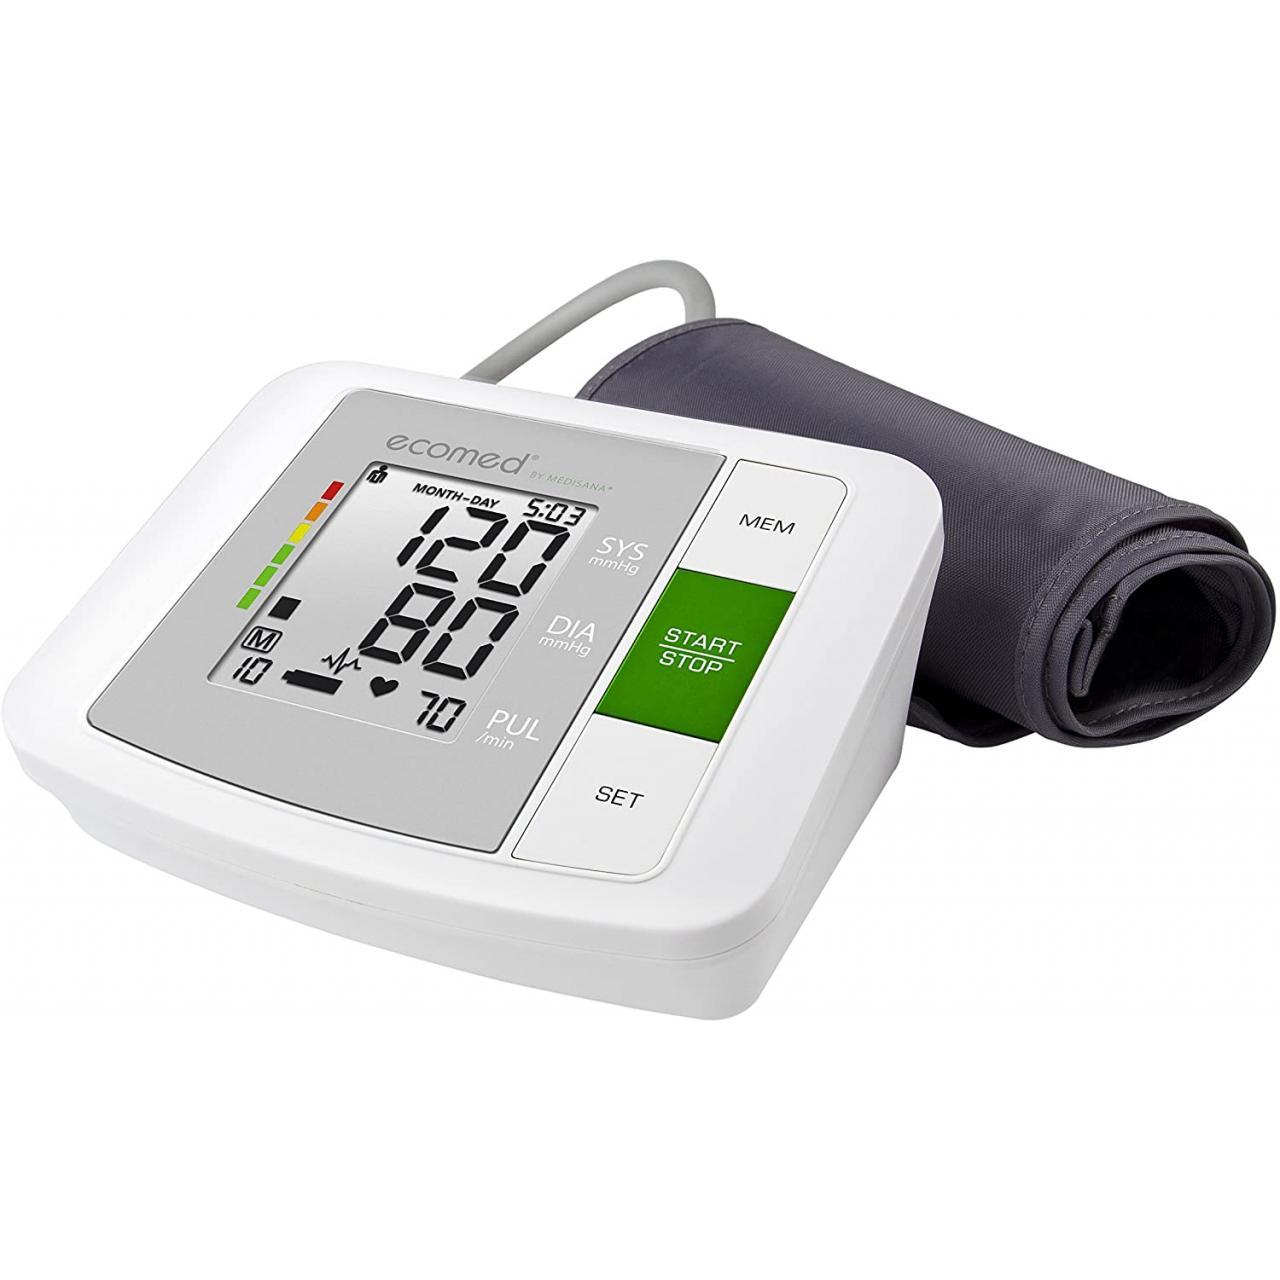 Tensiometru digital de brat Ecomed 23200, BU-90E